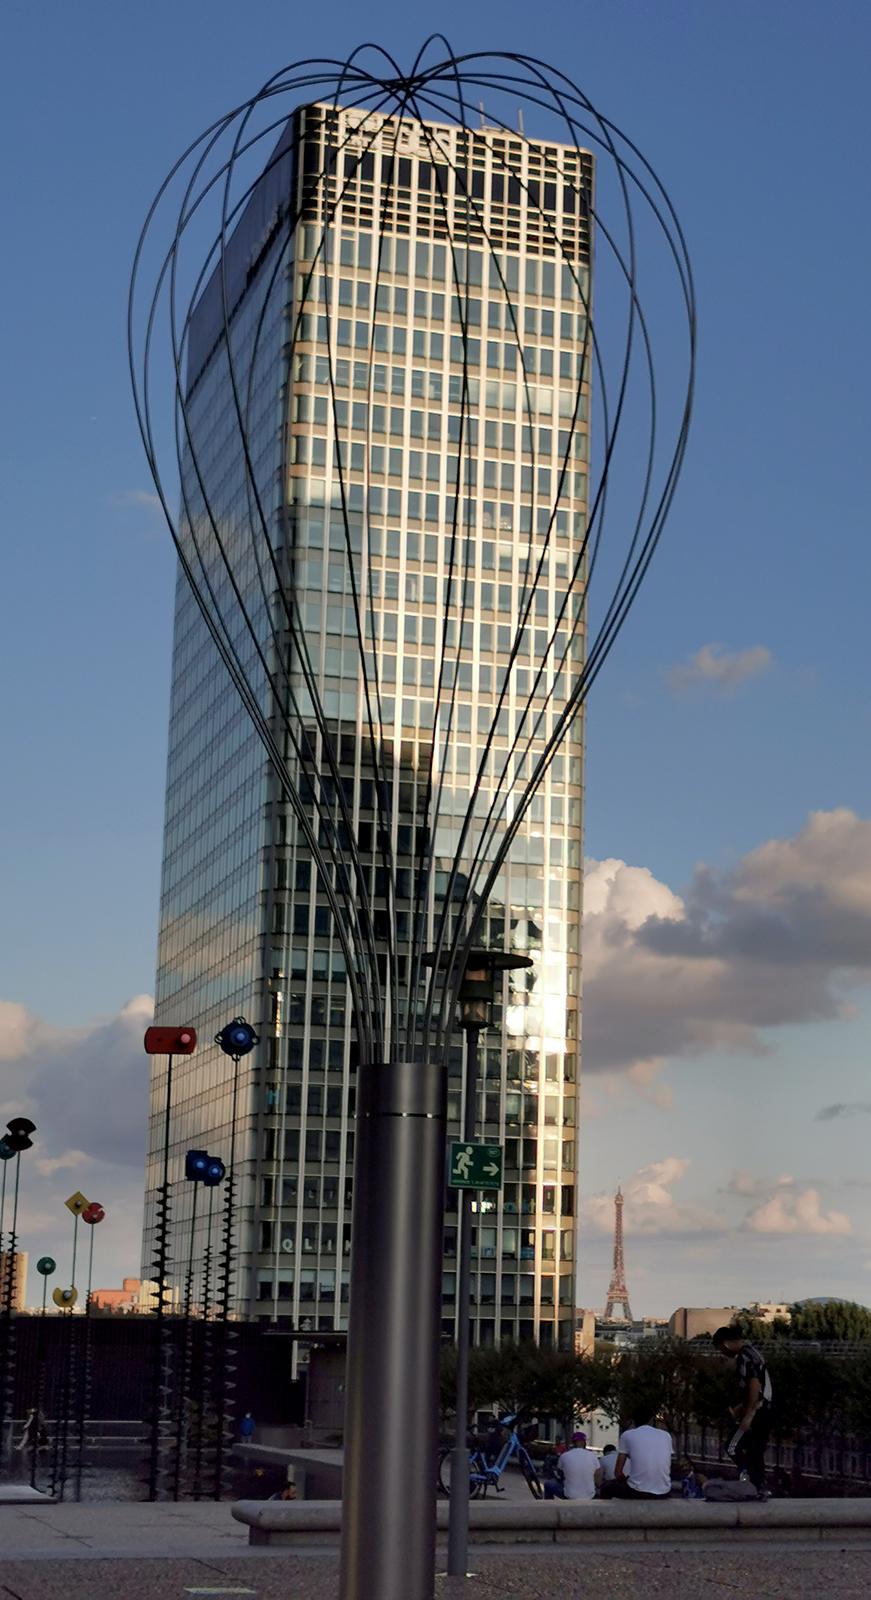 Cergy-Pontoise and La Défense